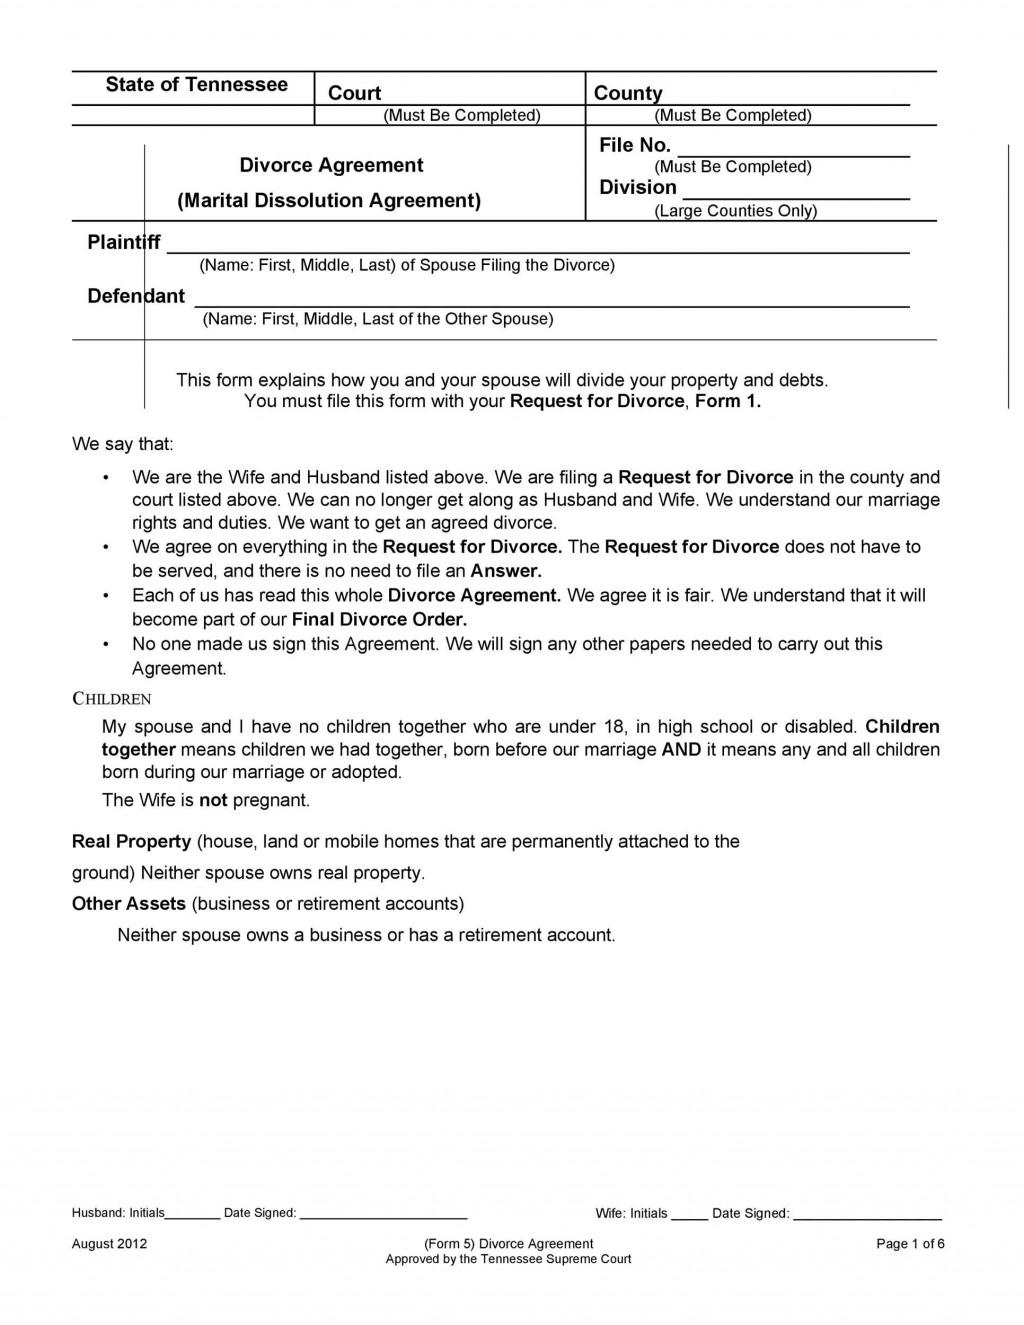 004 Dreaded Divorce Settlement Agreement Template Photo  Sample New York Marital Uk South AfricaLarge